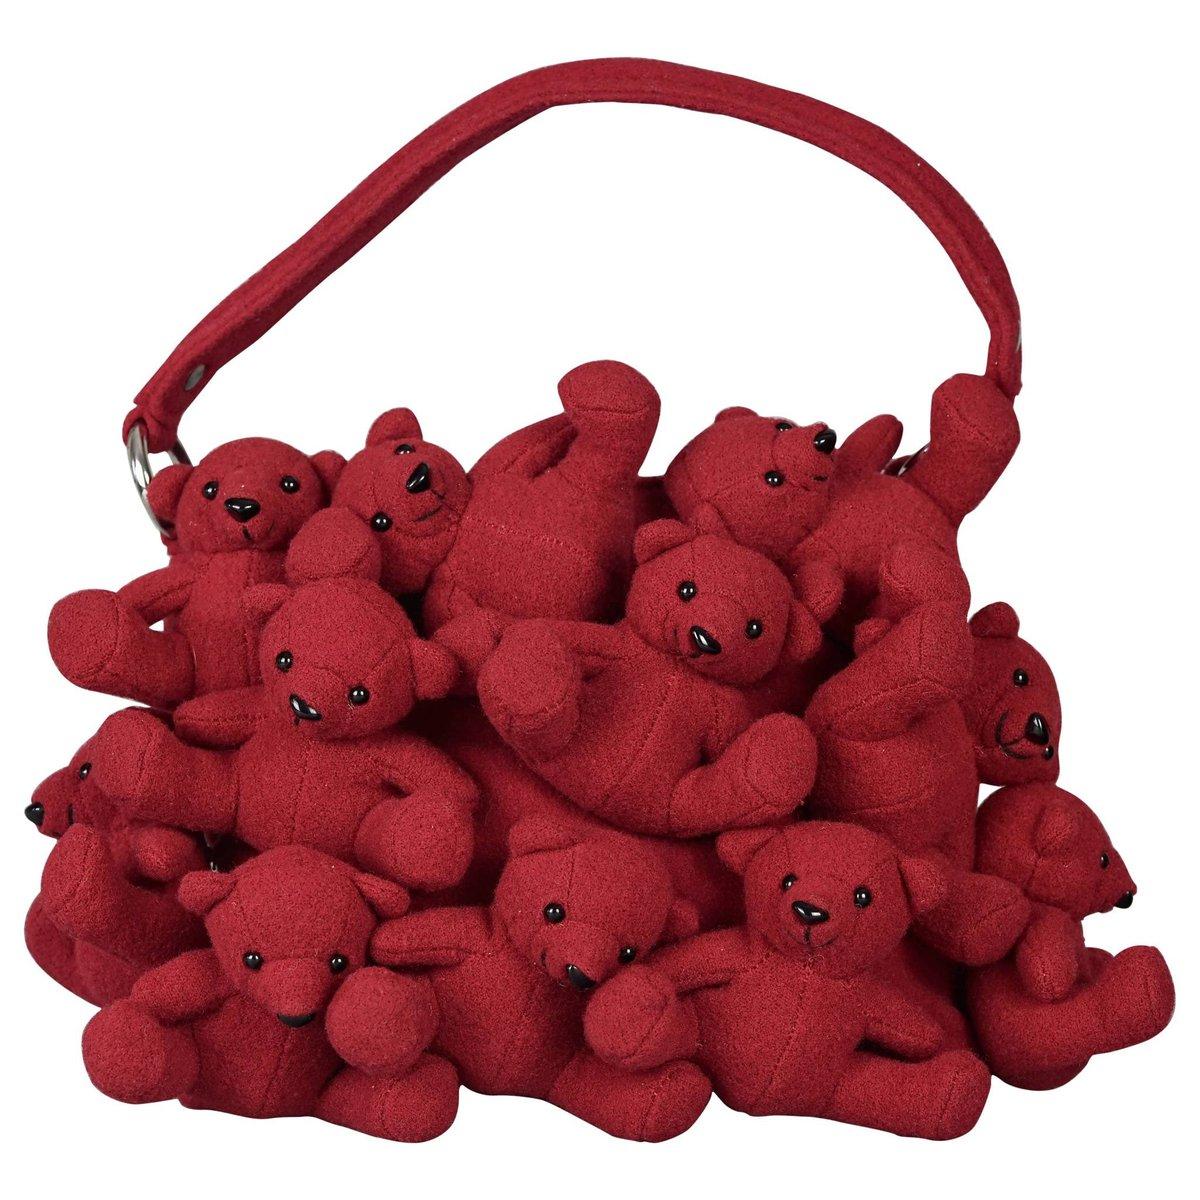 Vintage Moschino Teddy Bear Bag https://t.co/FixCARnTug